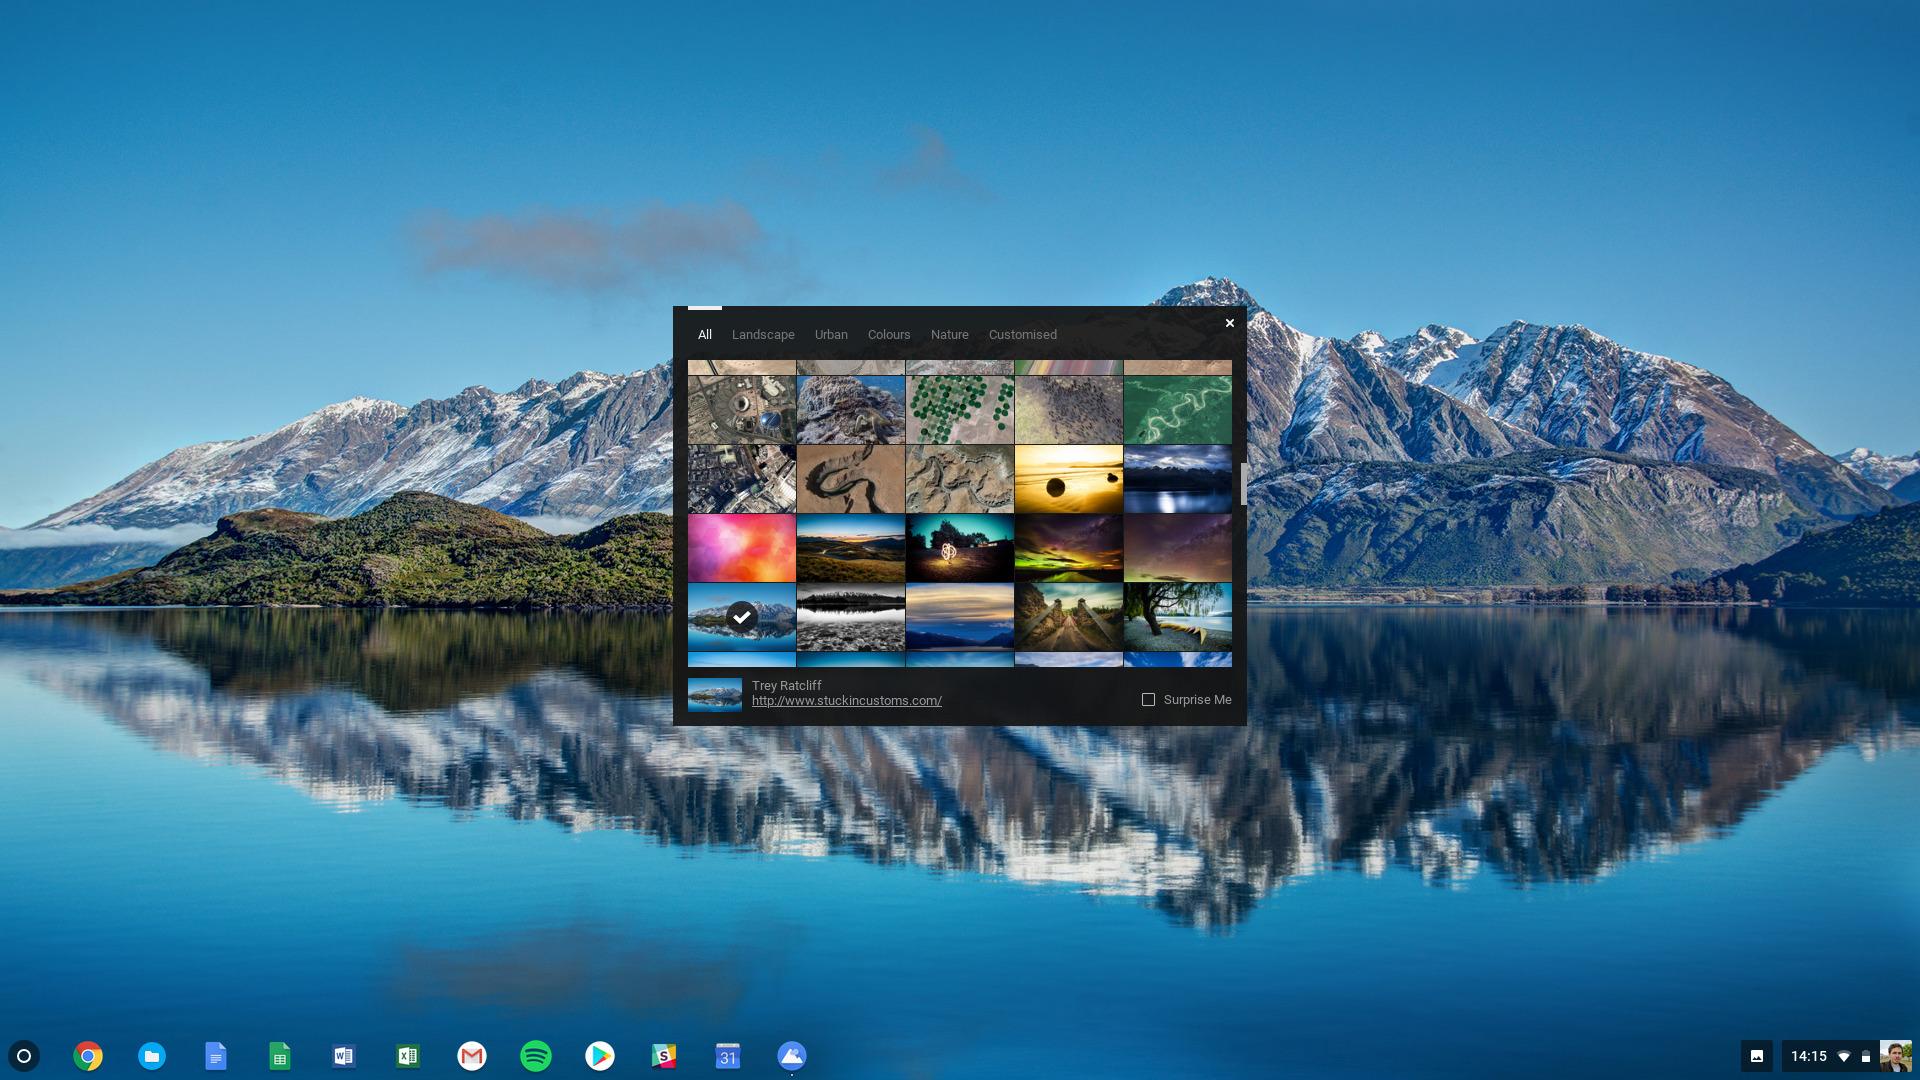 Chromebook wallpaper -- how to change wallpaper on Chromebook